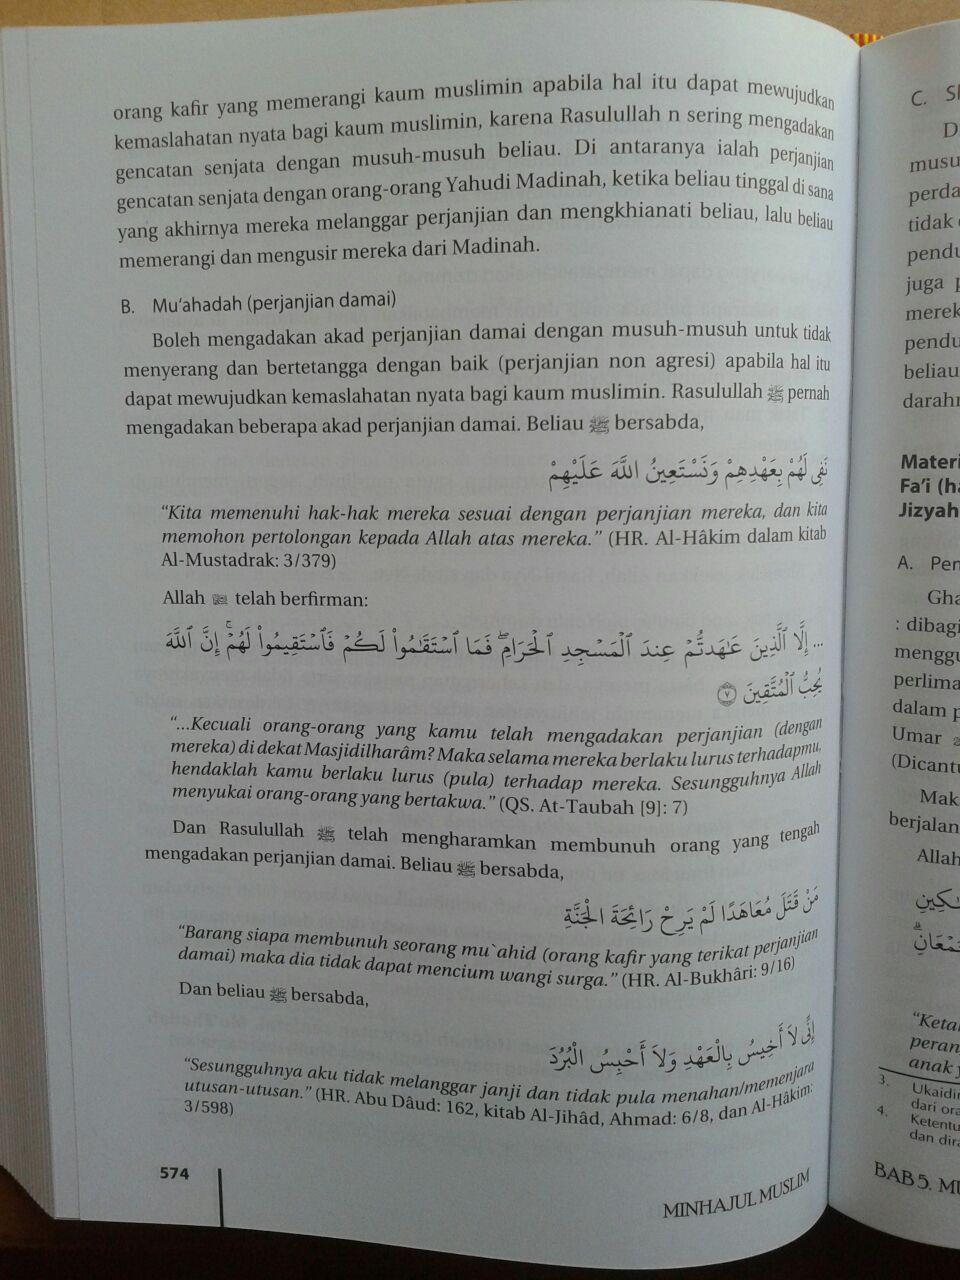 Buku Minhajul Muslim Pedoman Hidup Ideal Seorang Muslim isi